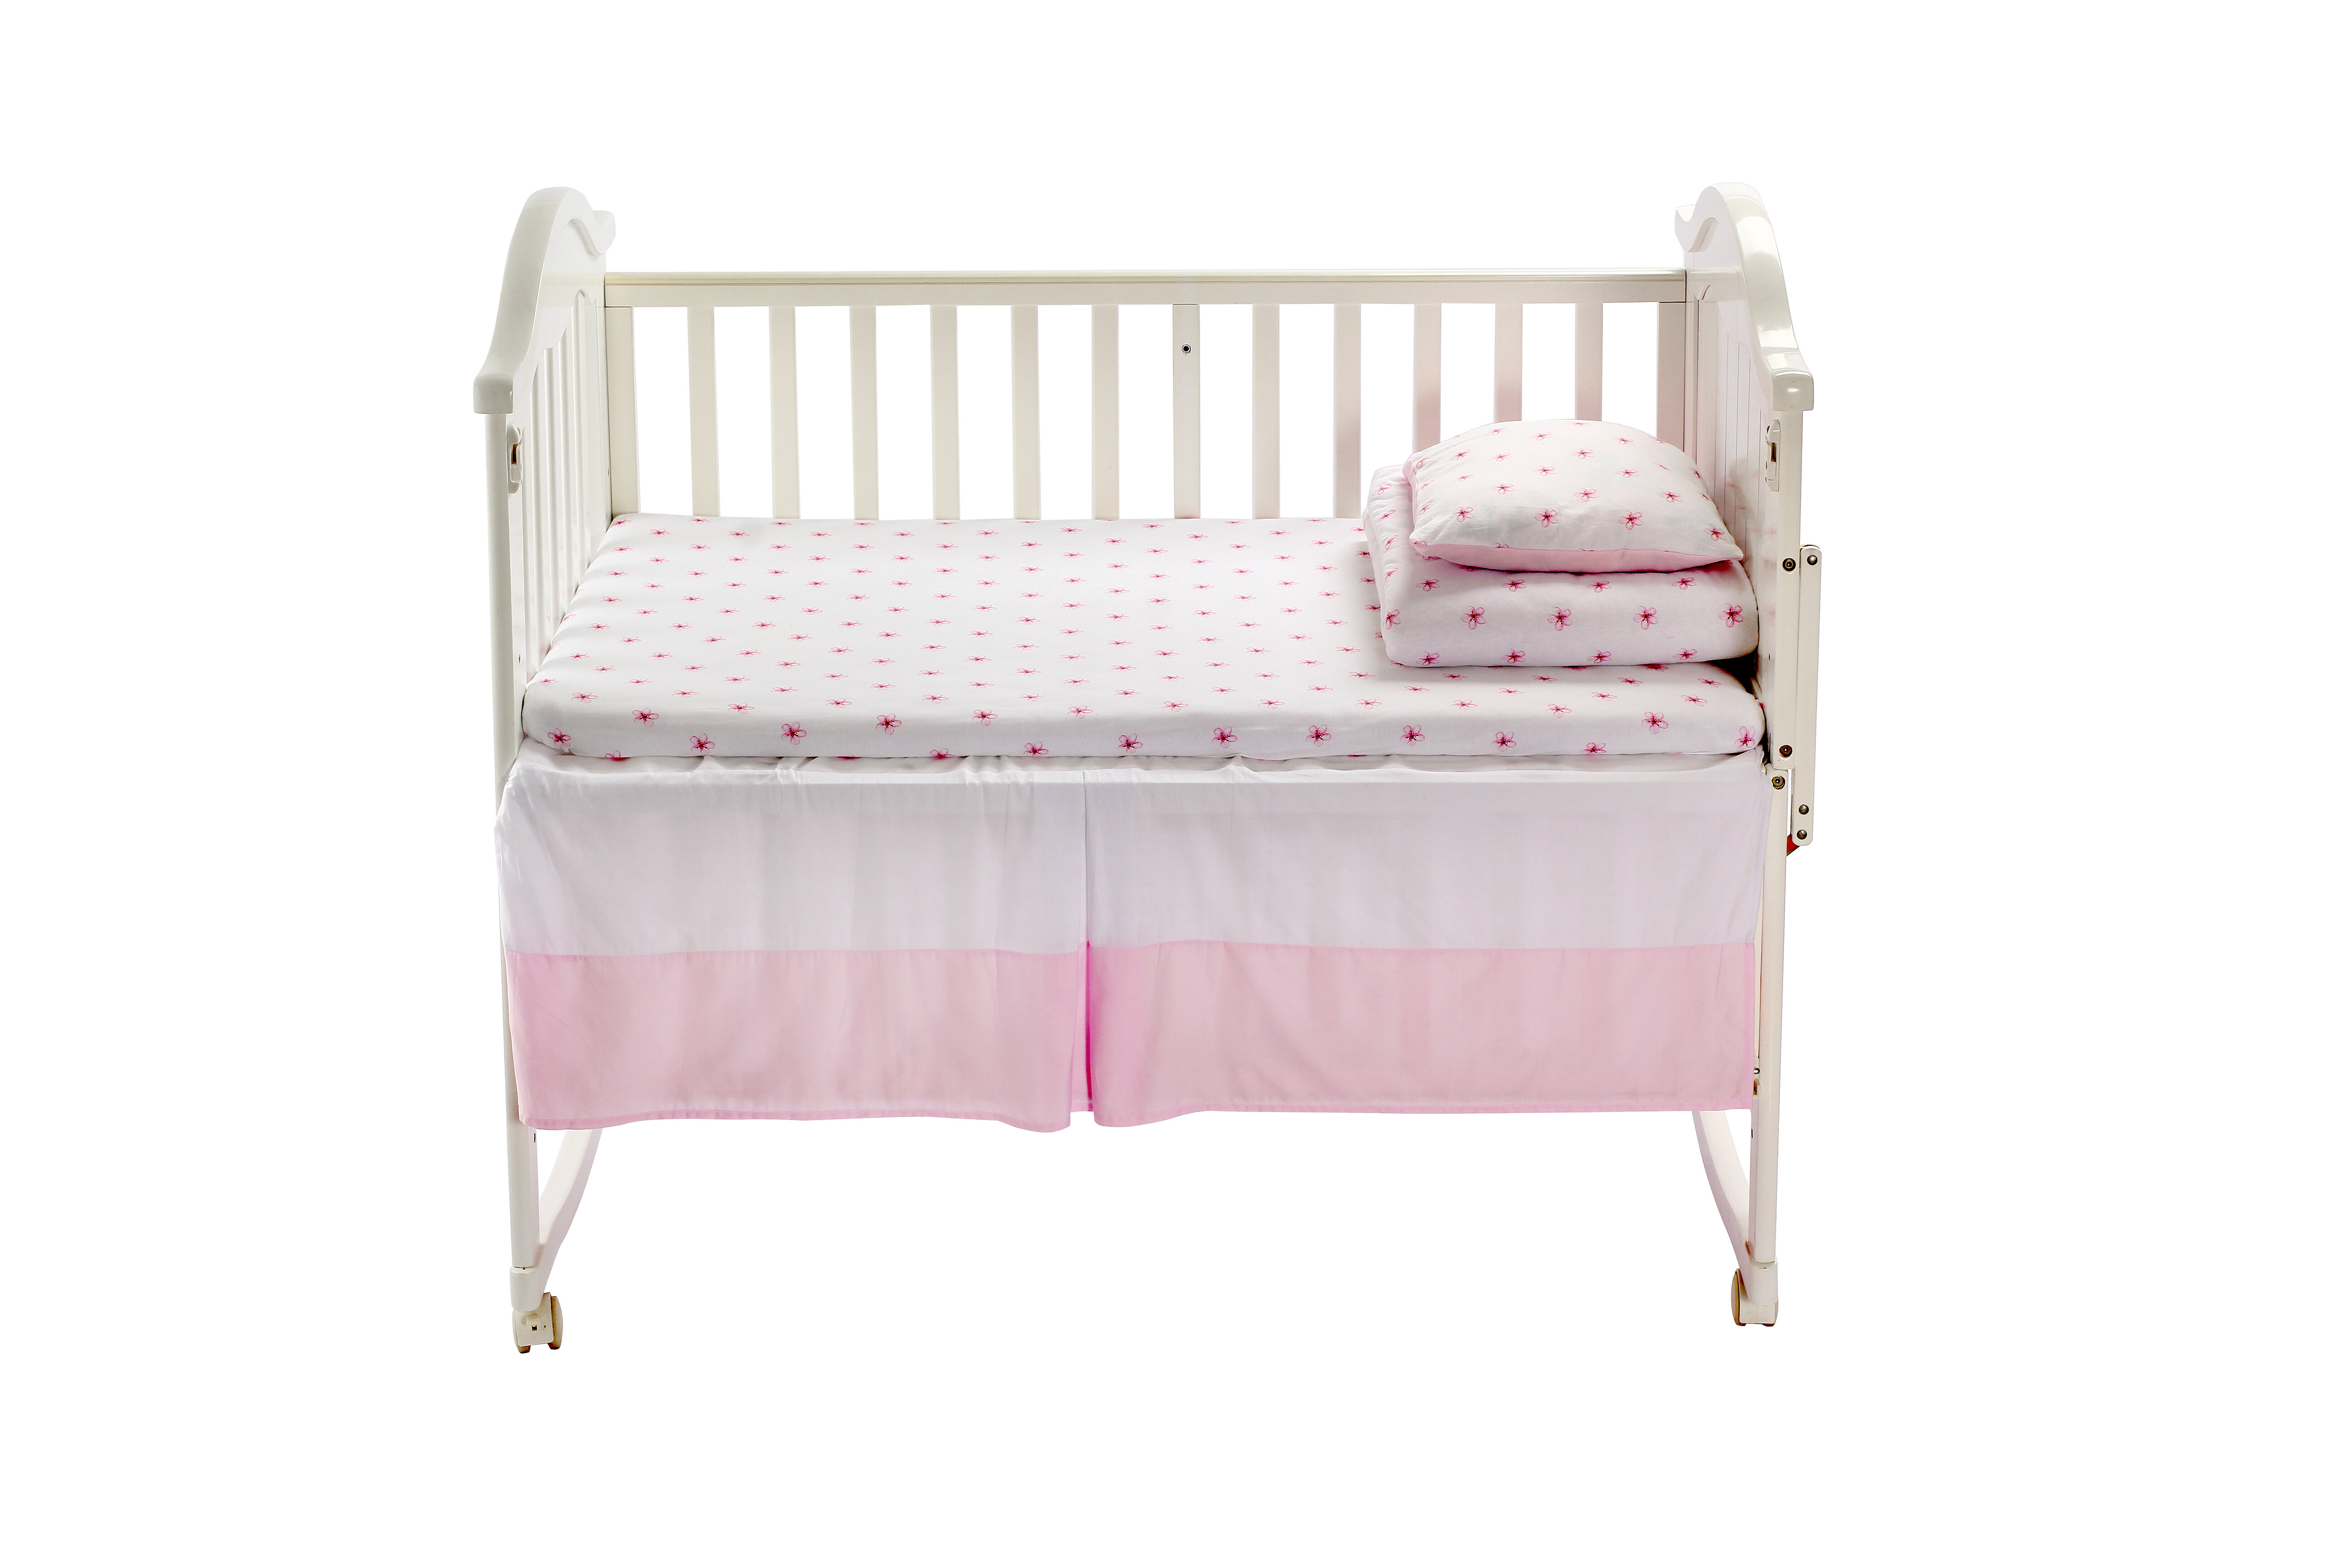 Efactorytomedotcom 4 Piece Baby Crib Bedding Set Wayfair Ca